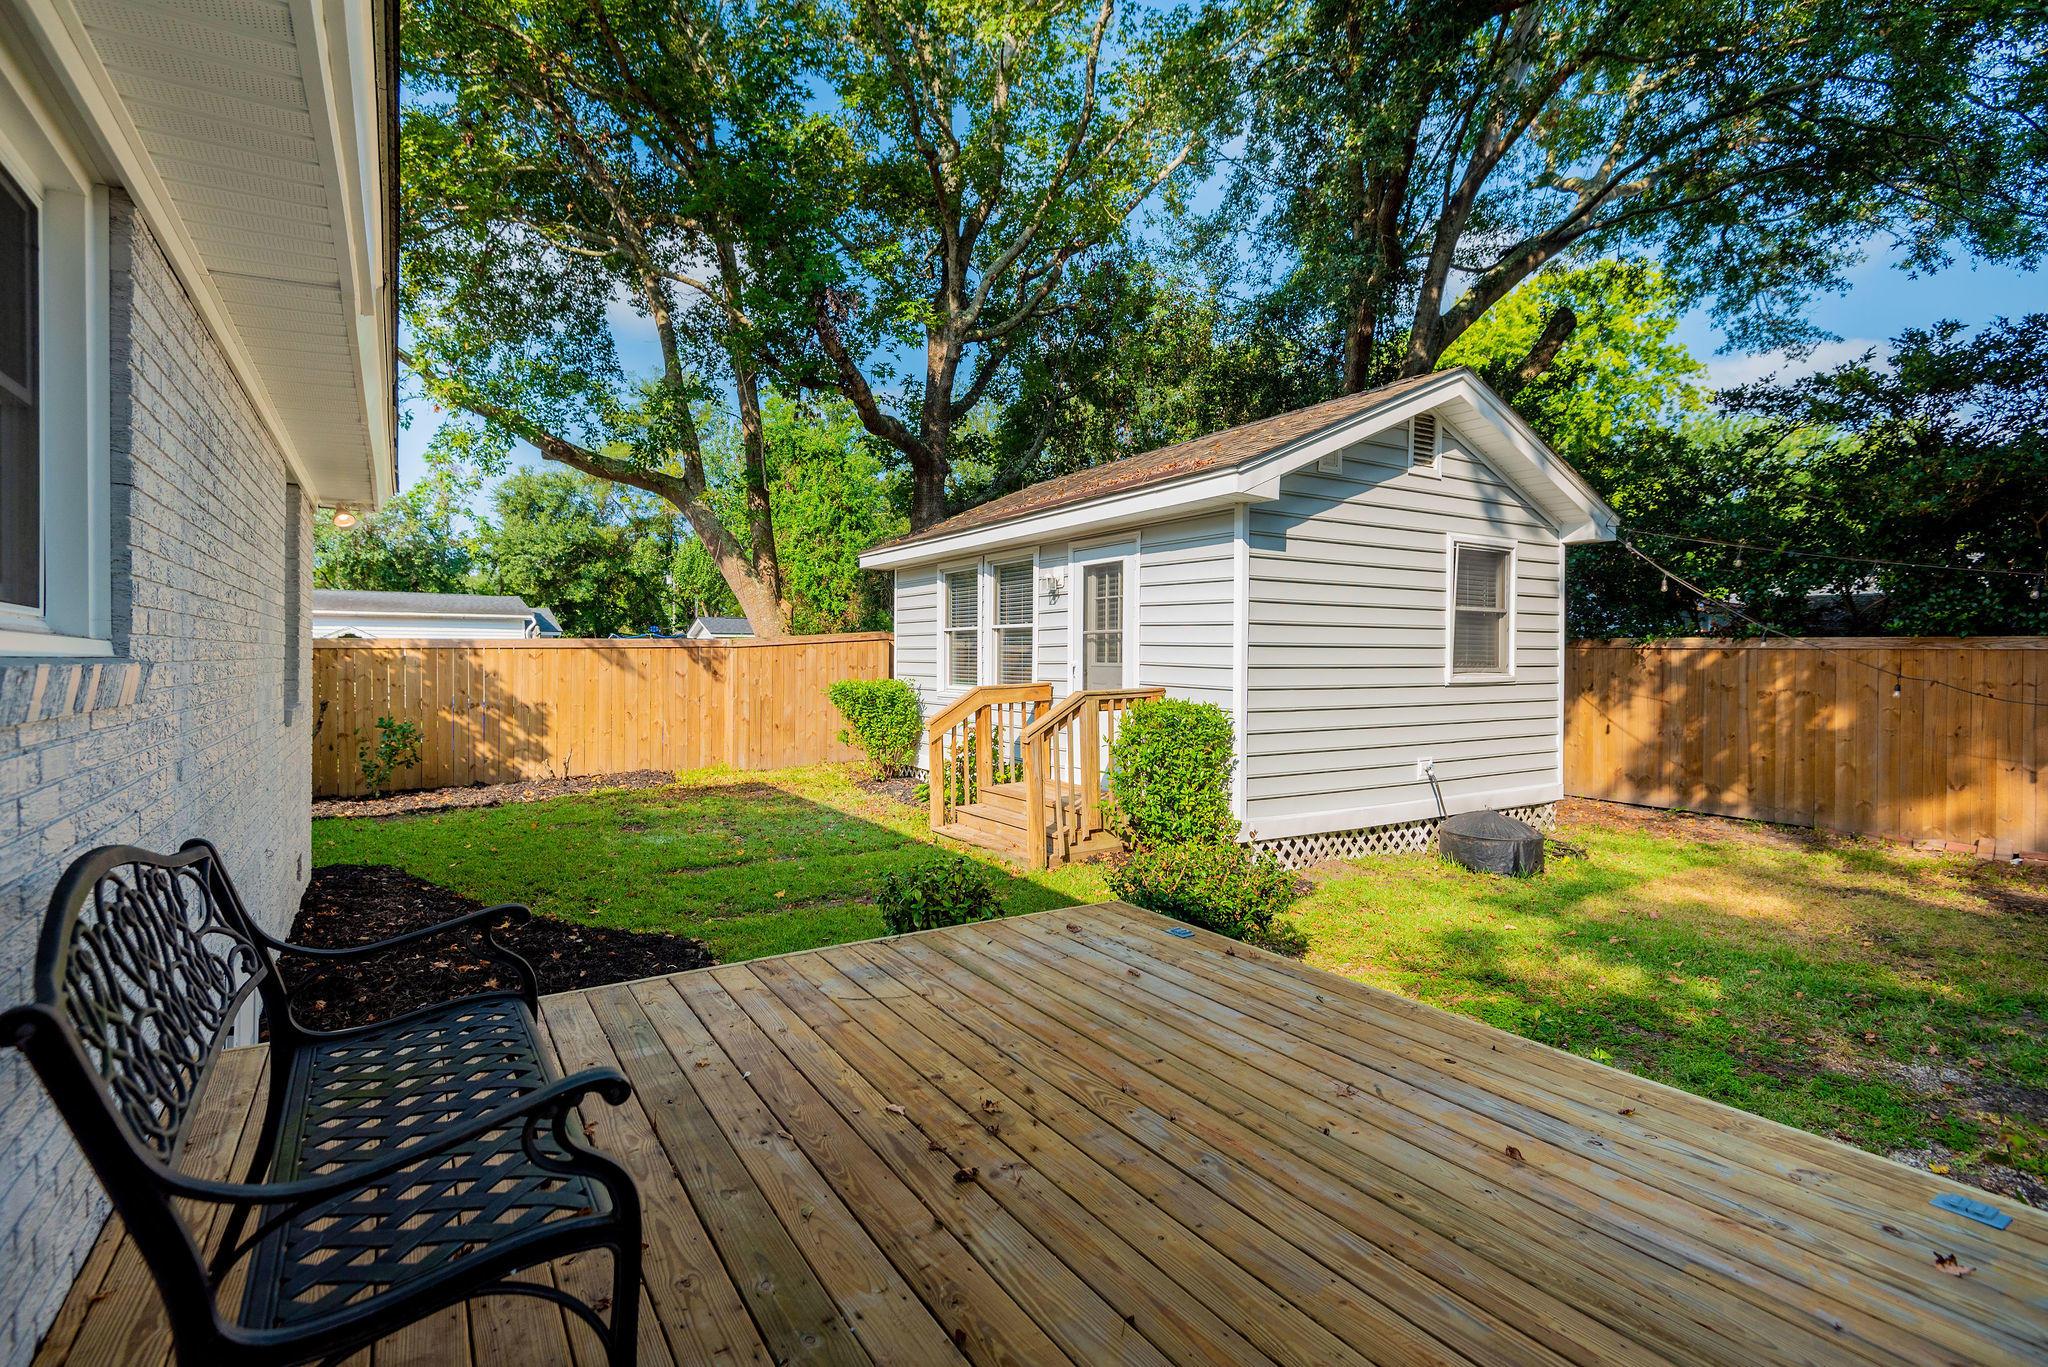 Old Mt Pleasant Homes For Sale - 914 Center, Mount Pleasant, SC - 46